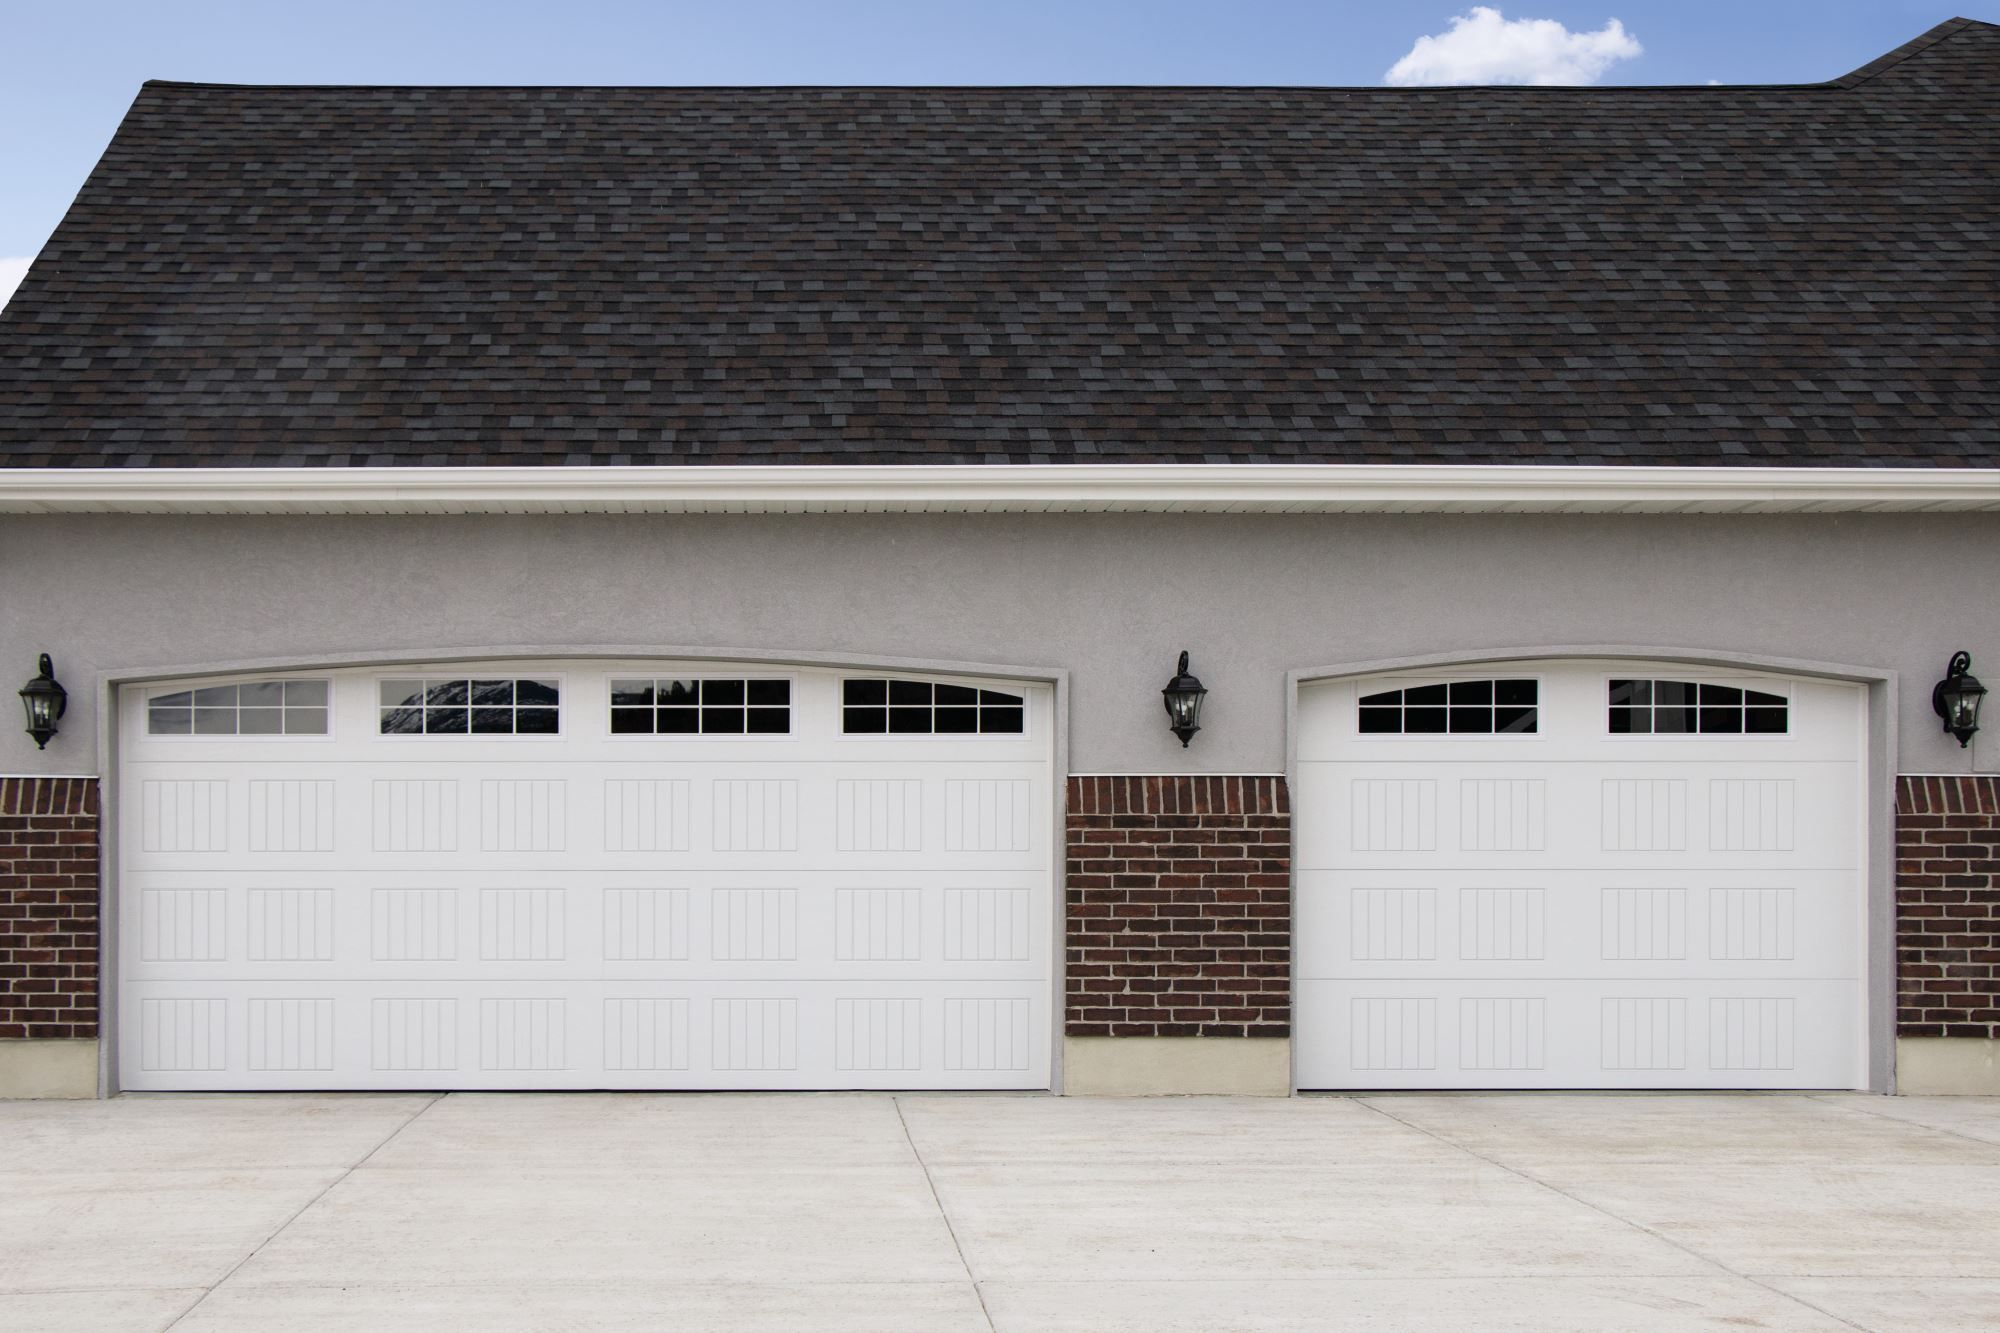 Residential Garage Doors Residential Garage Doors Garage Doors Wayne Dalton Garage Doors